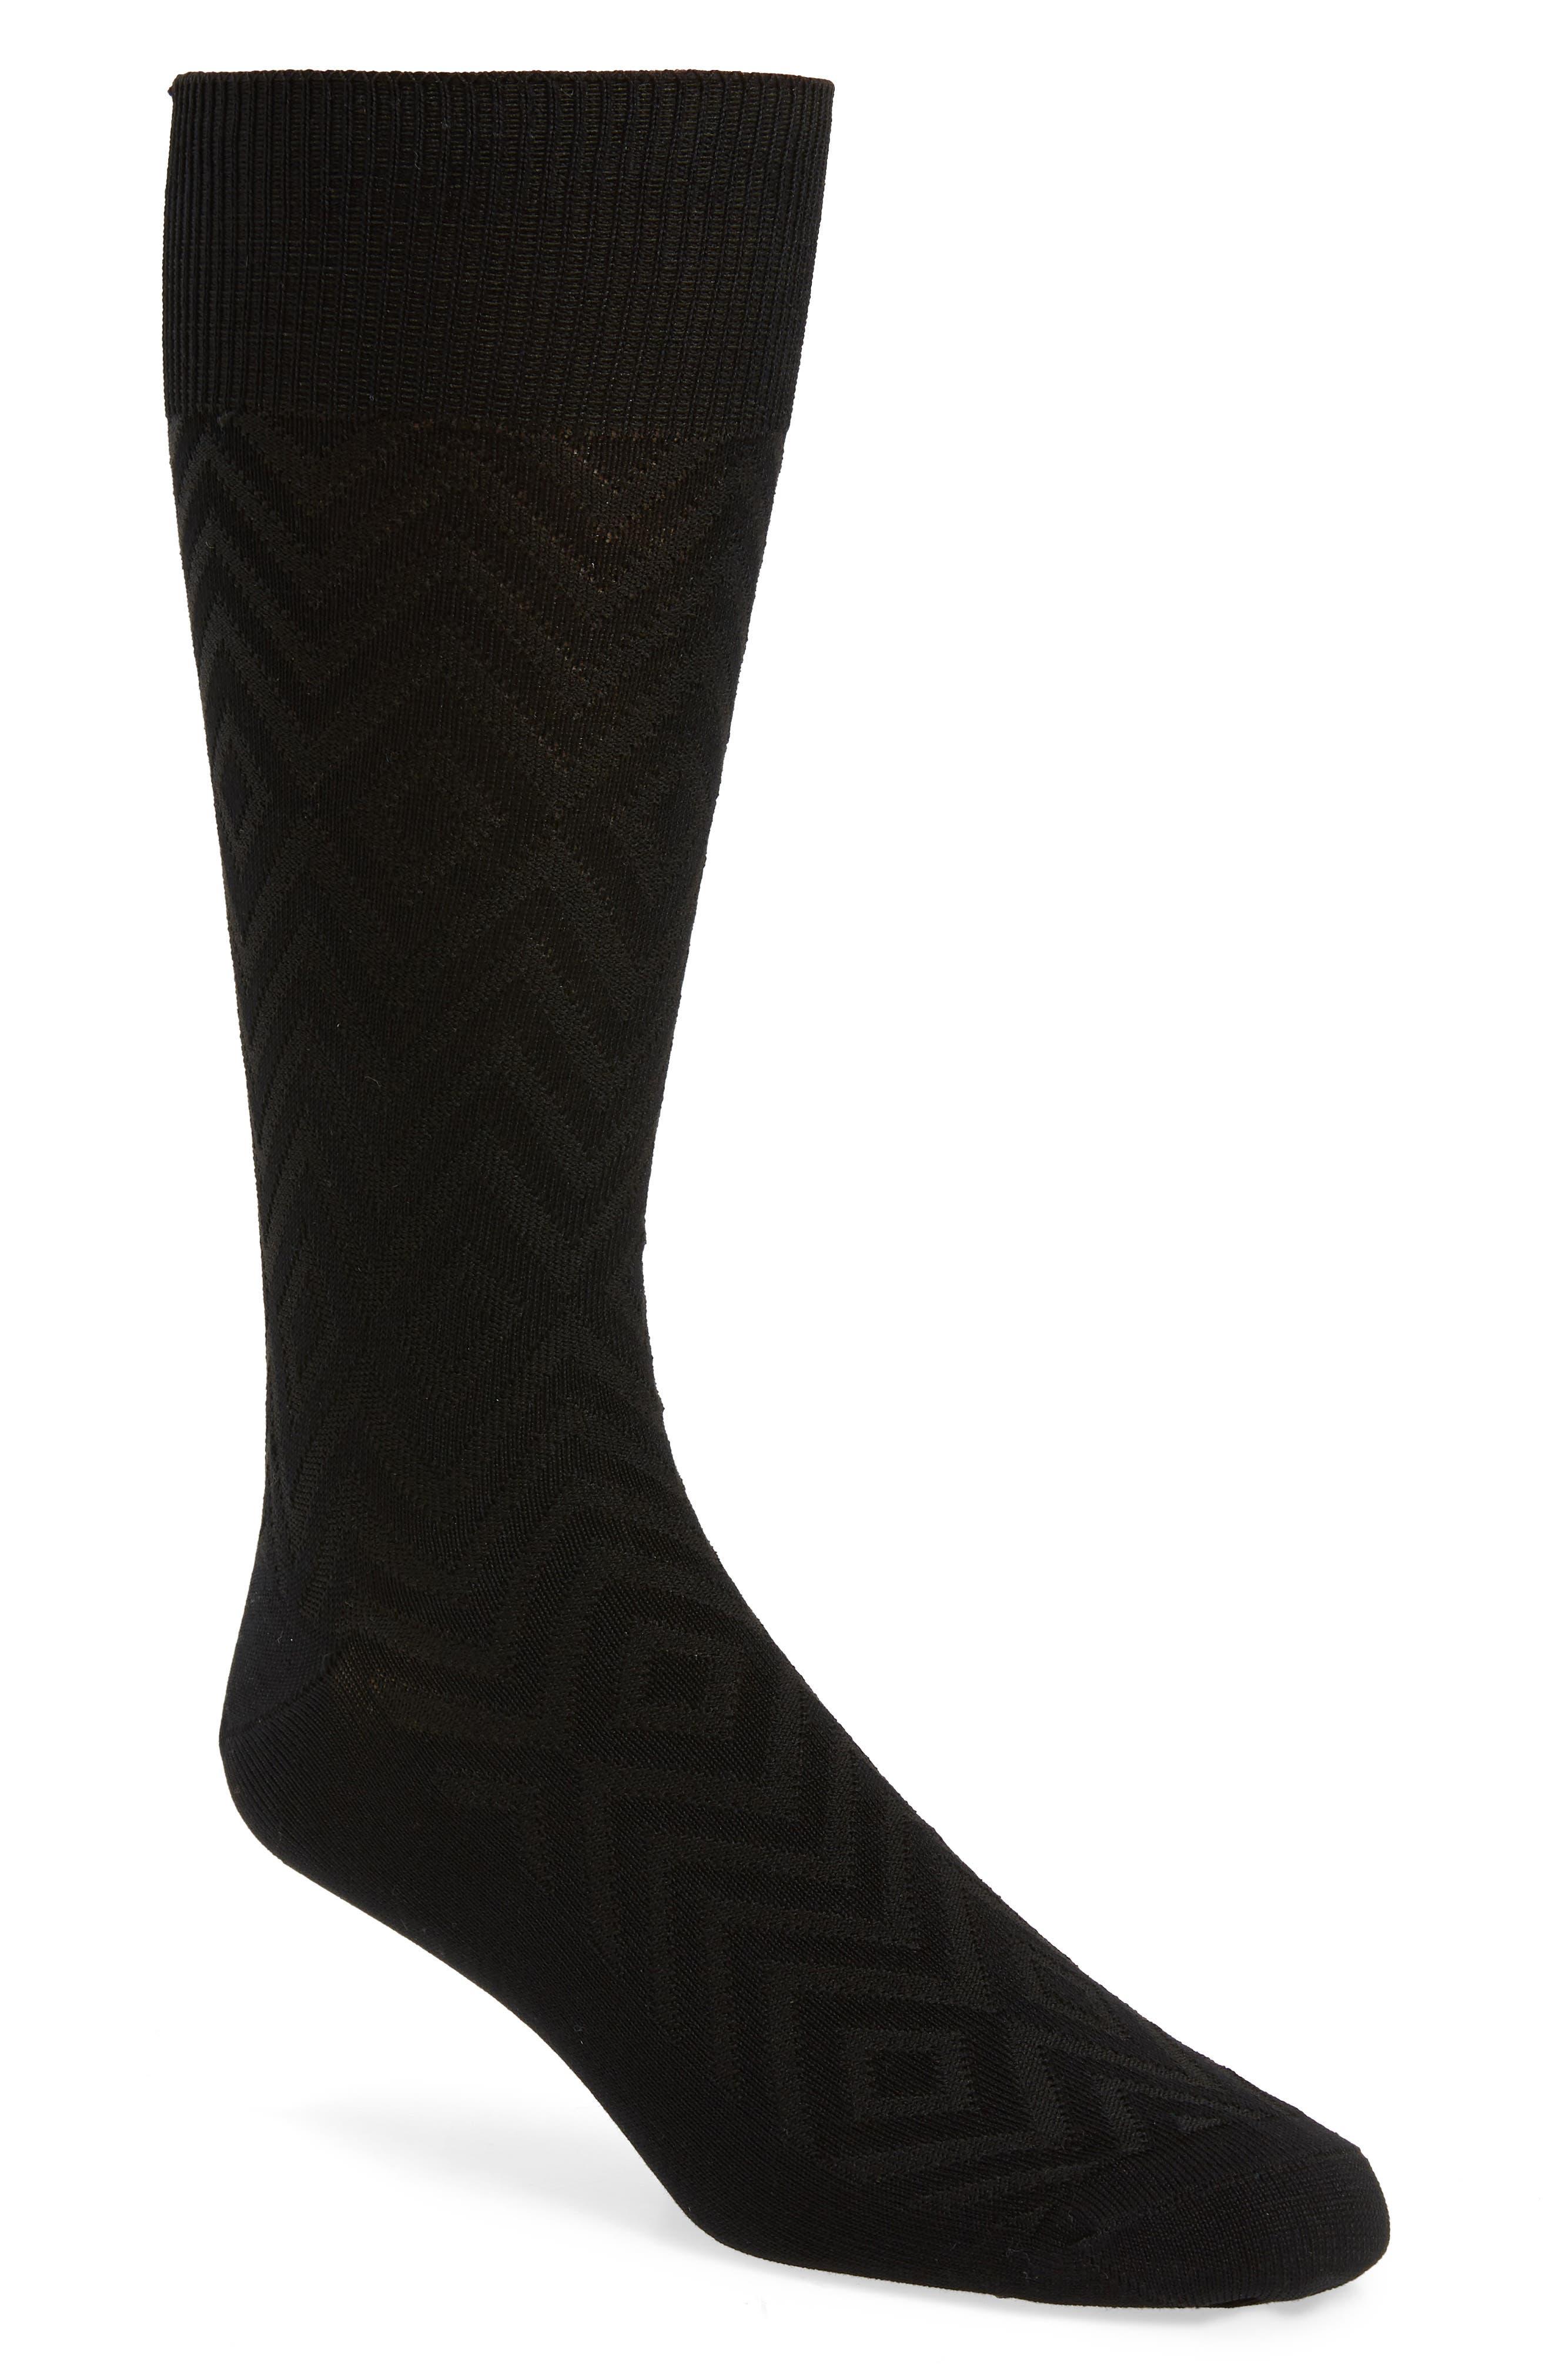 Chevron Socks,                         Main,                         color, BLACK